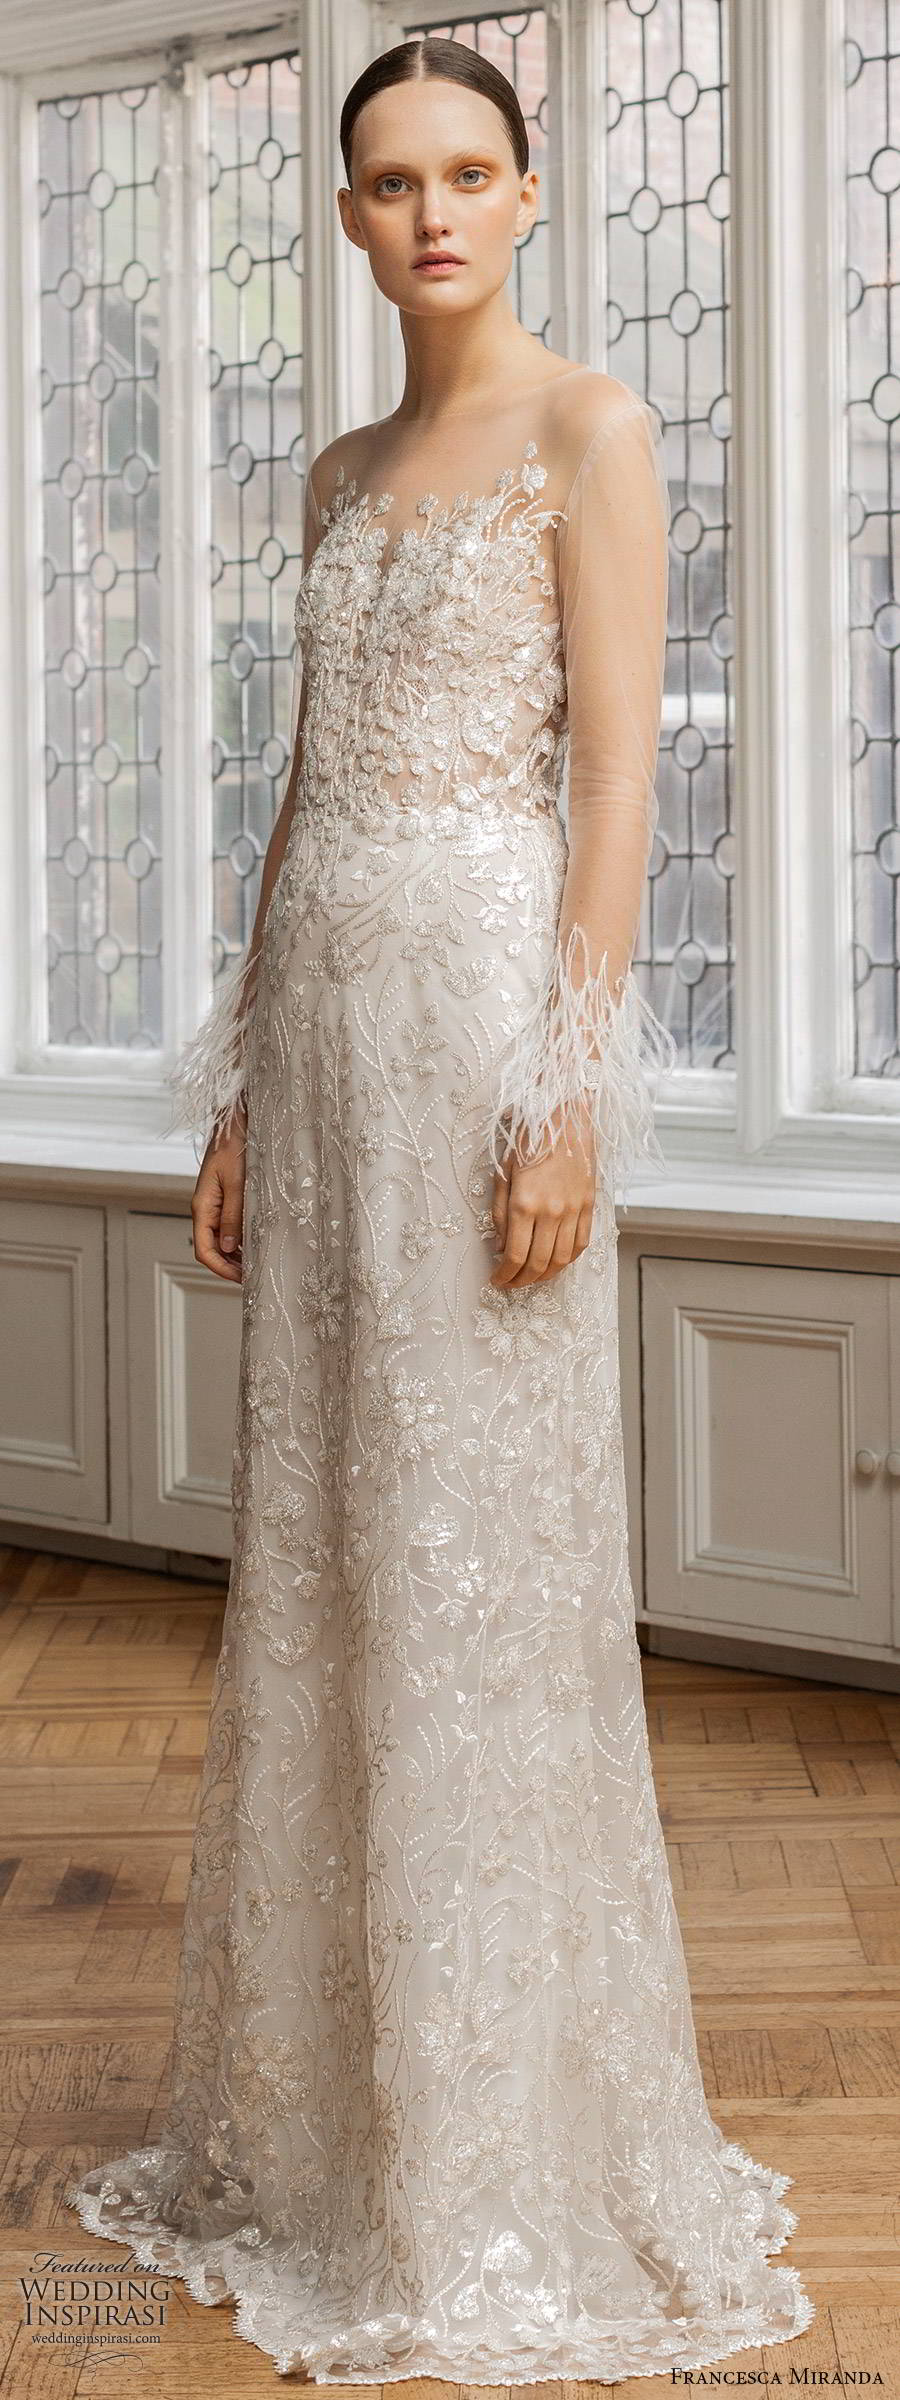 francesca miranda spring 2020 bridal illusion long sleeves sheer bateau sweetheart neckline fully embellished sheath wedding dress feathers glitzy sweep train (1) mv